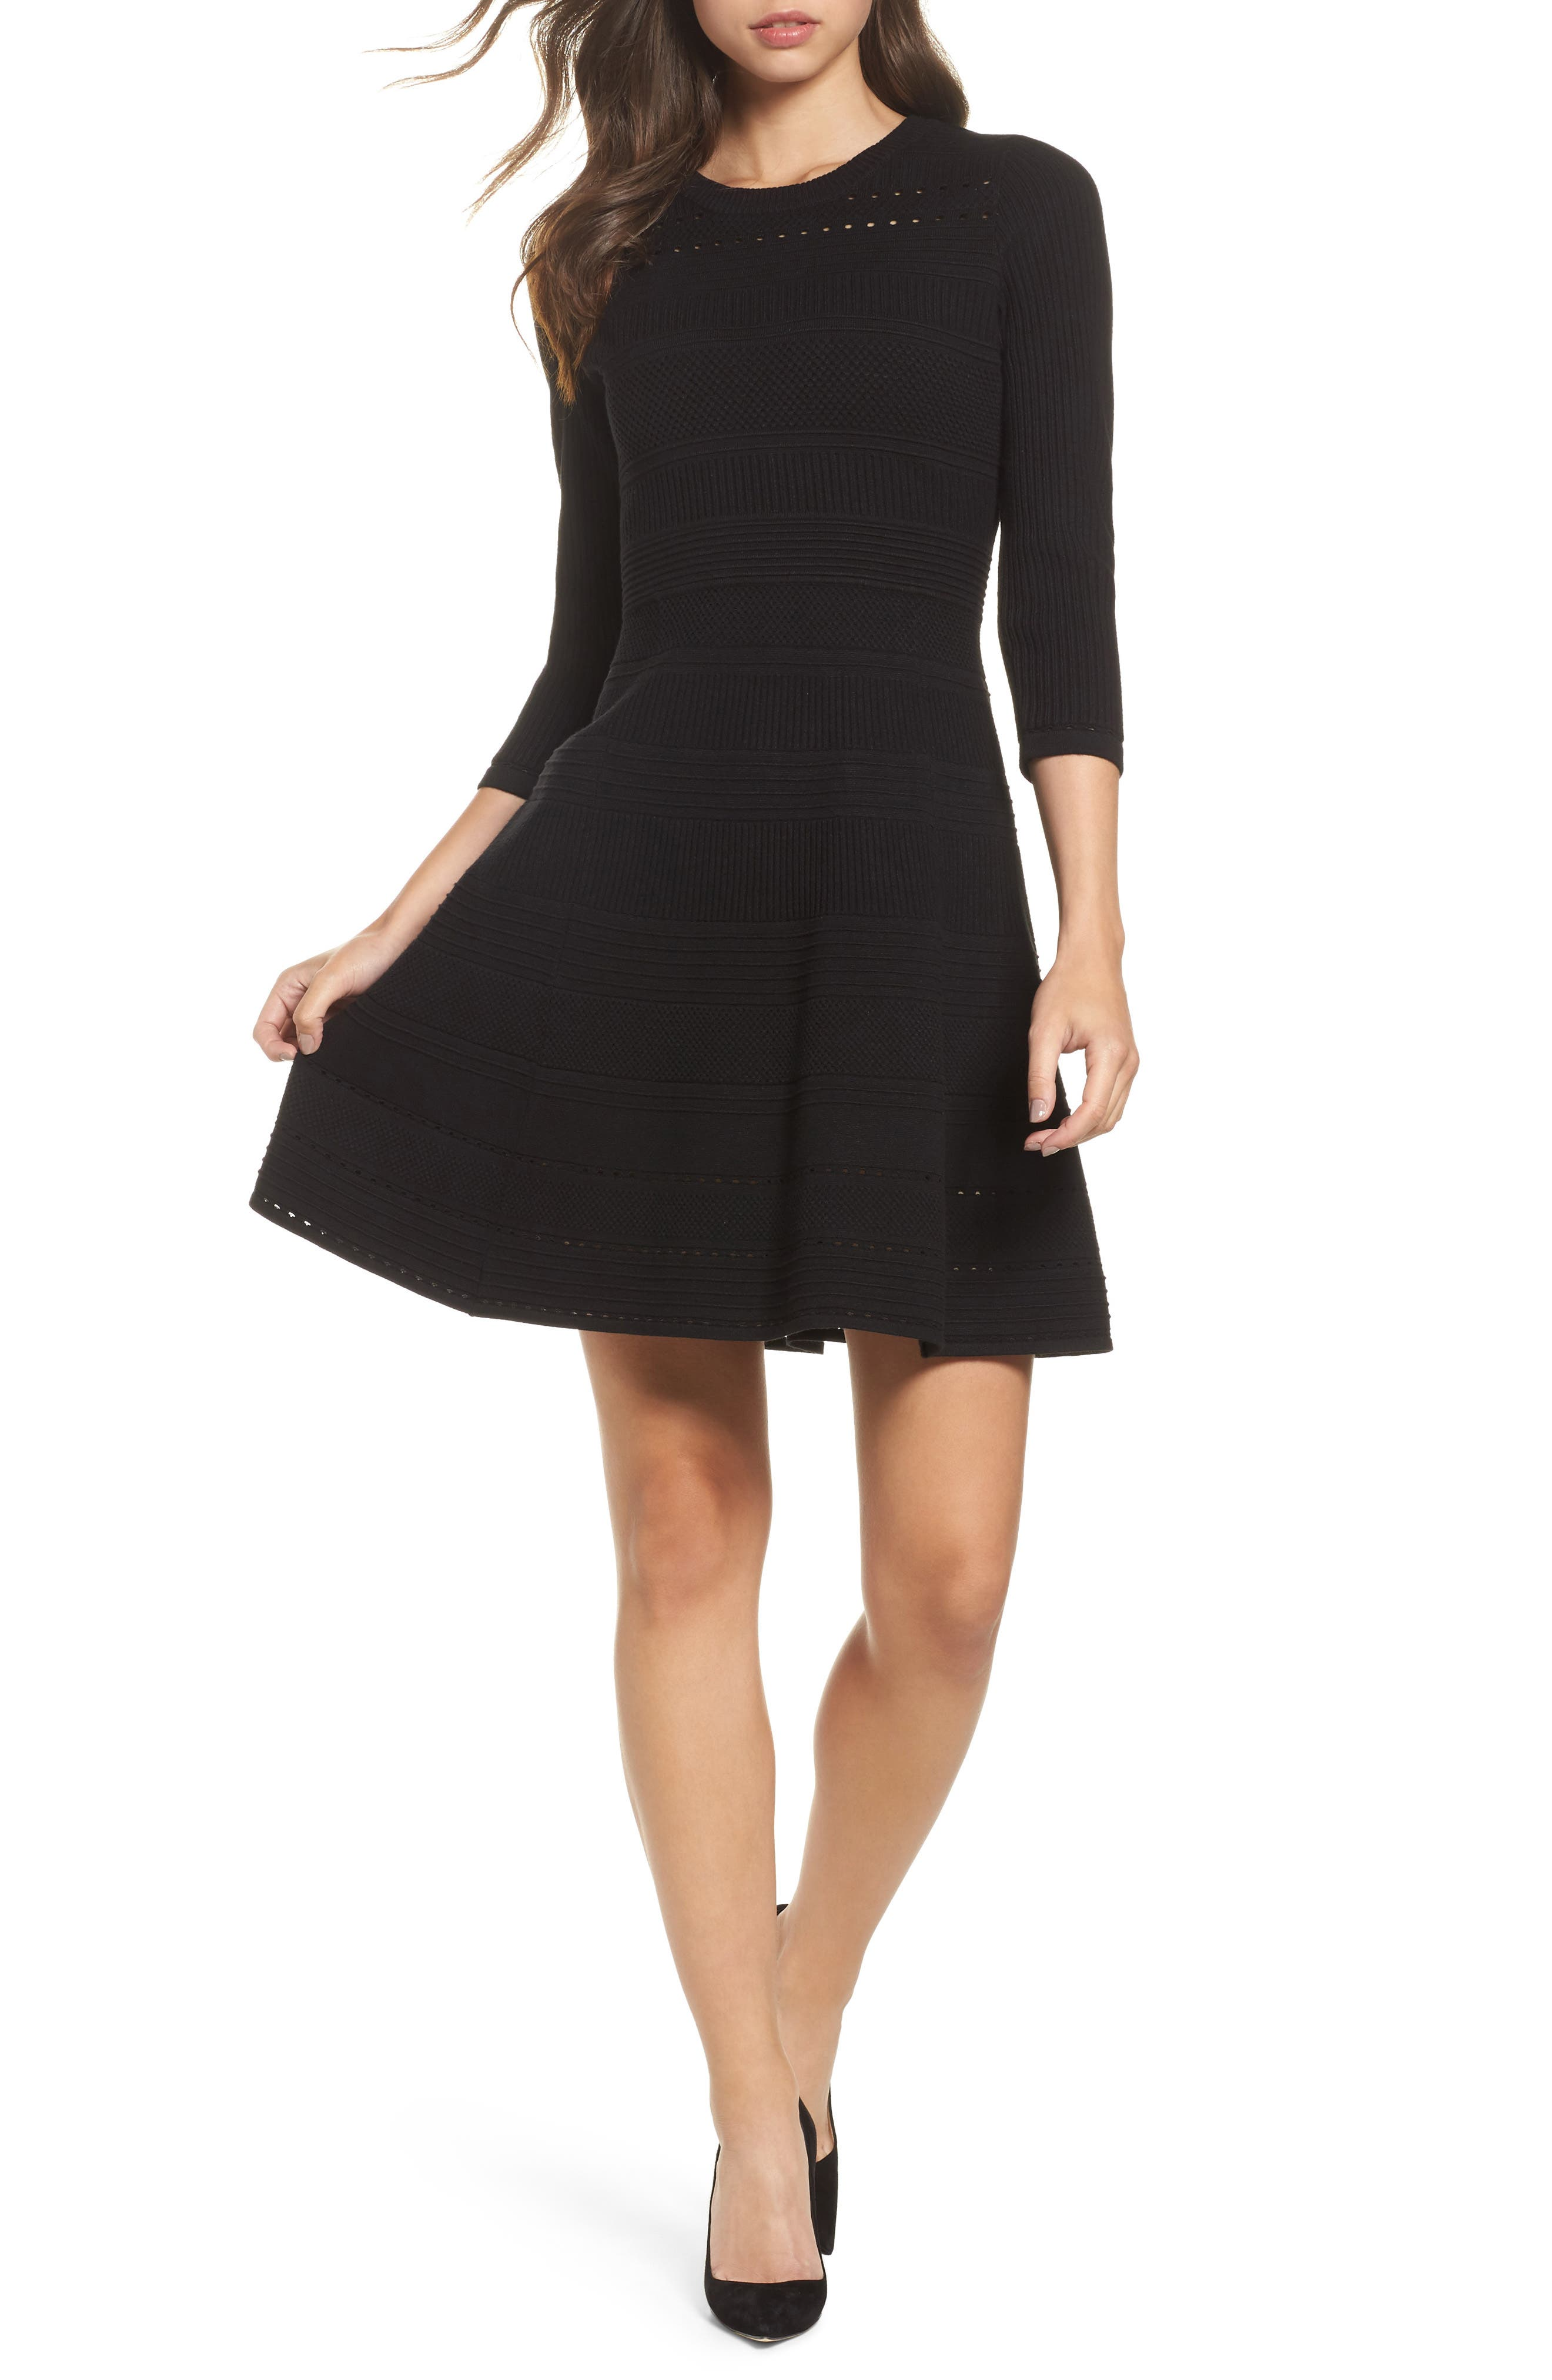 Sara james black dress